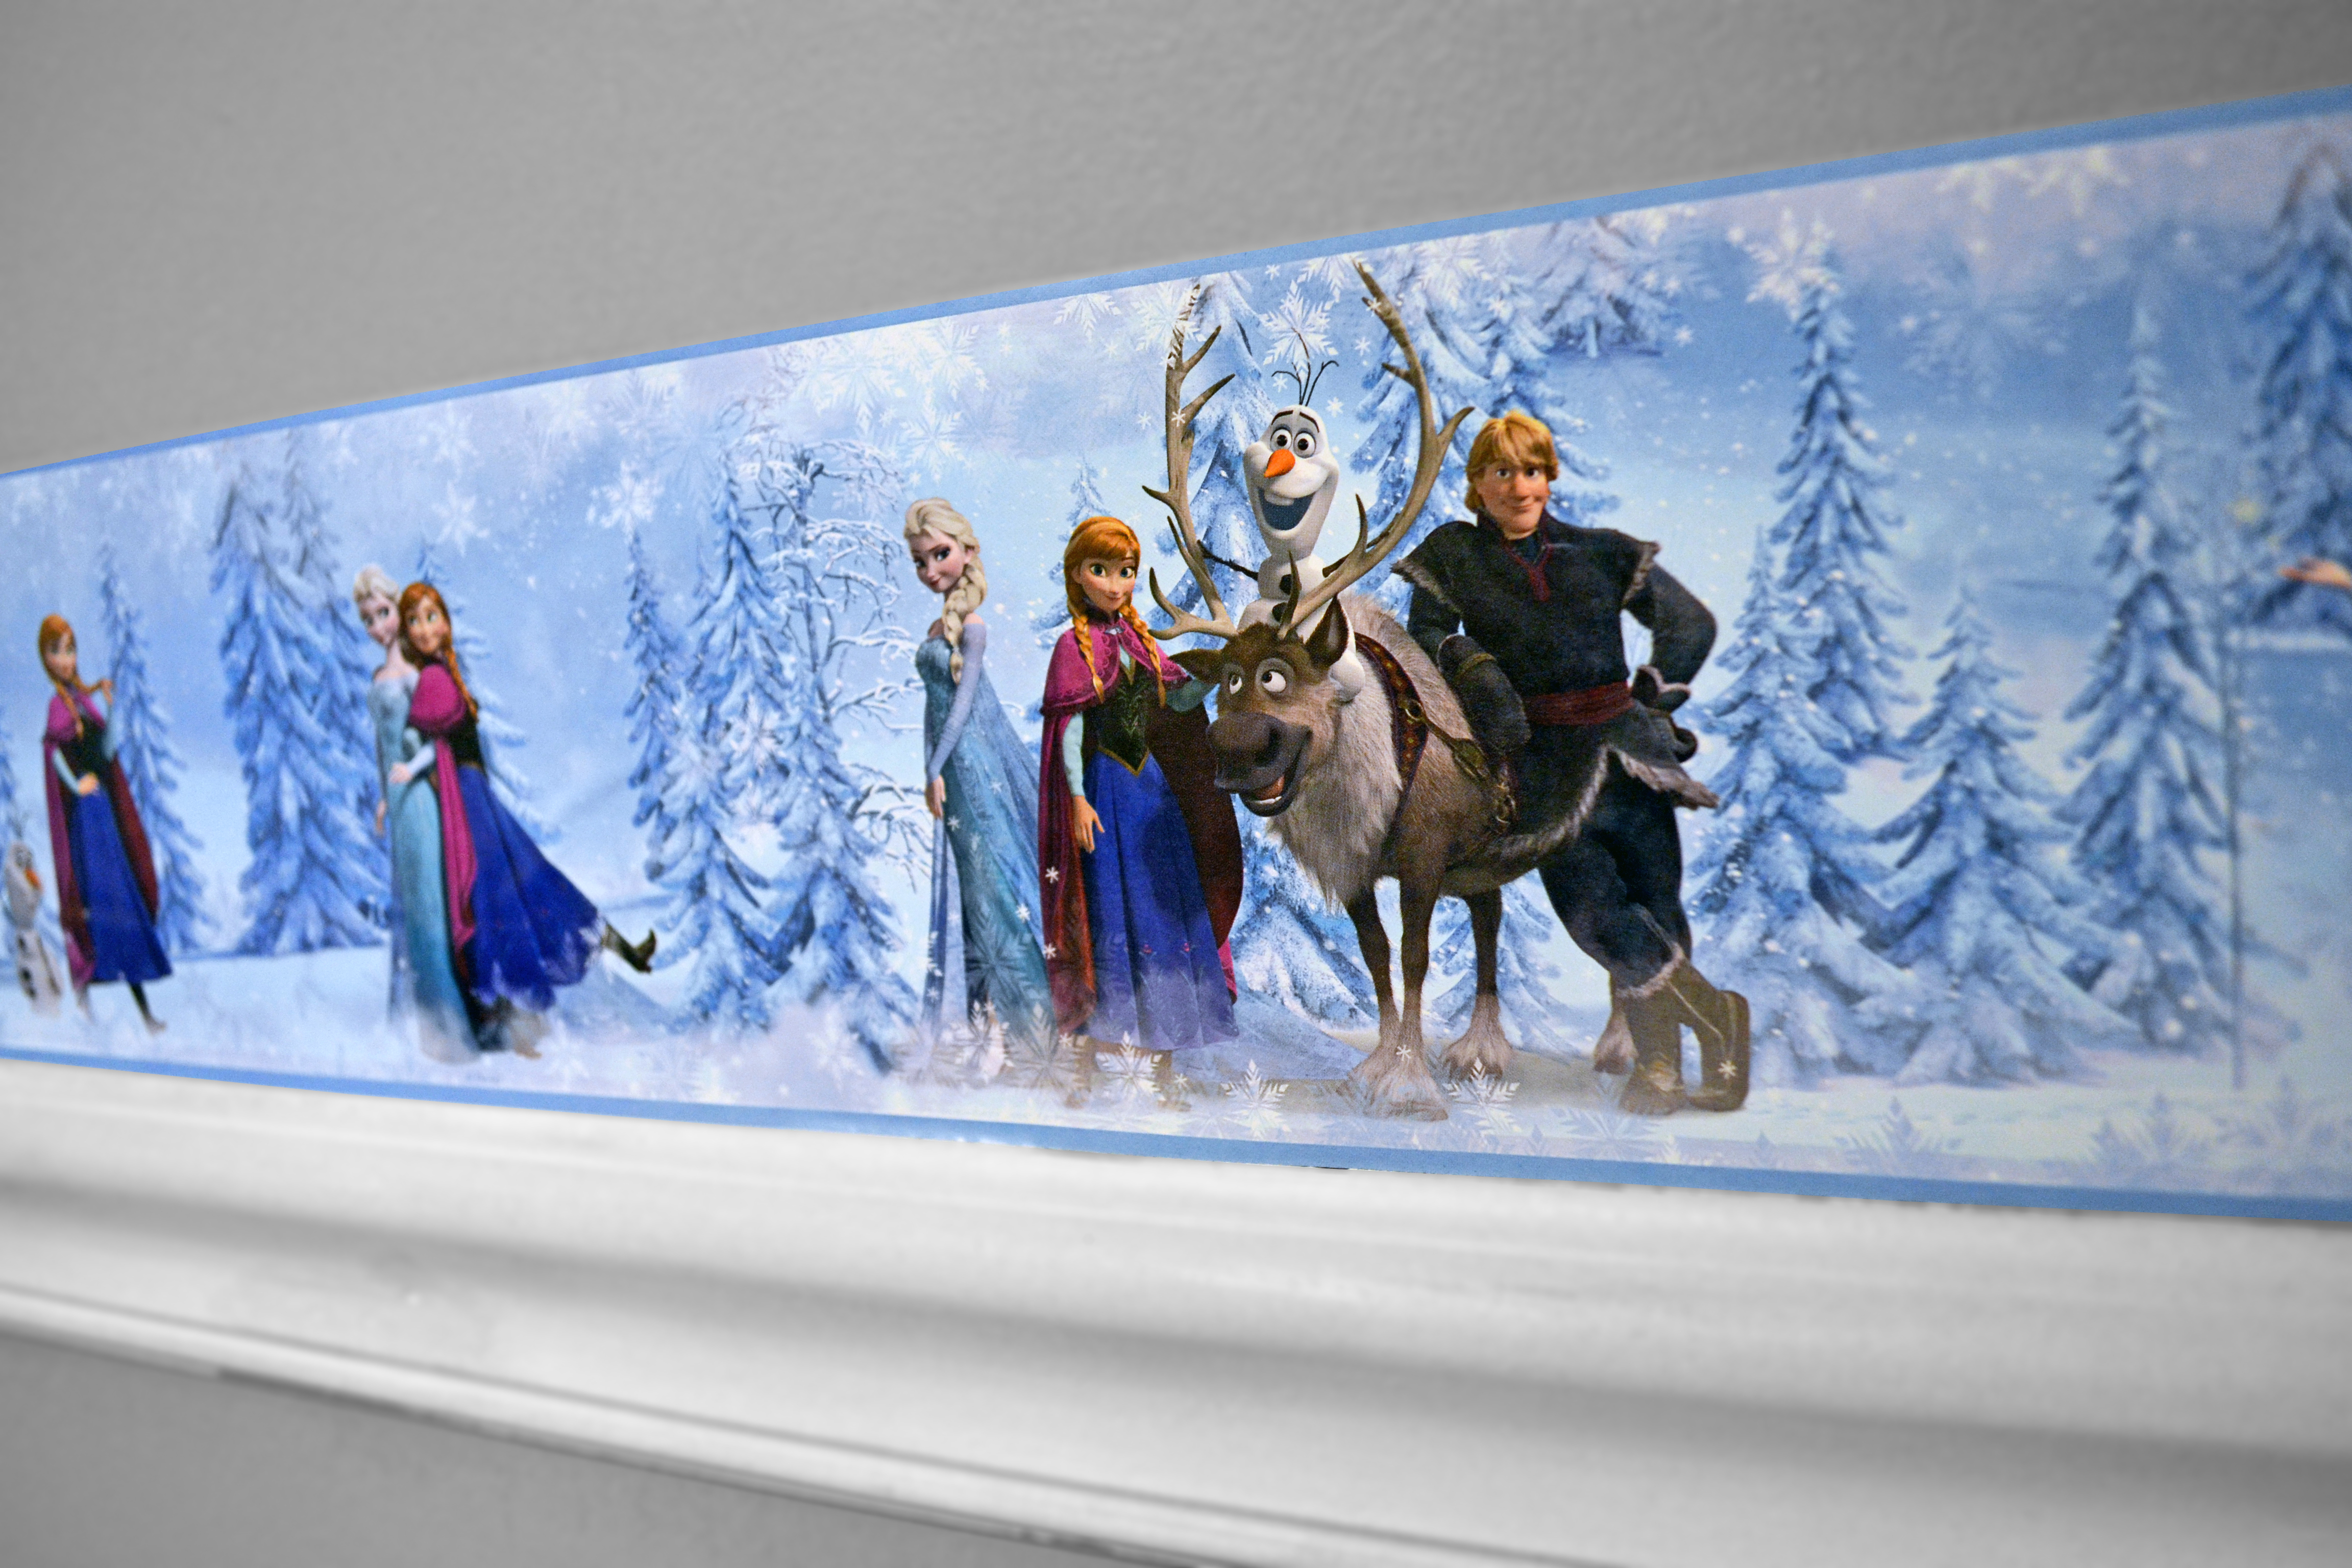 Disney Frozen Border Frozen Border Bedroom Makeover 4608x3072